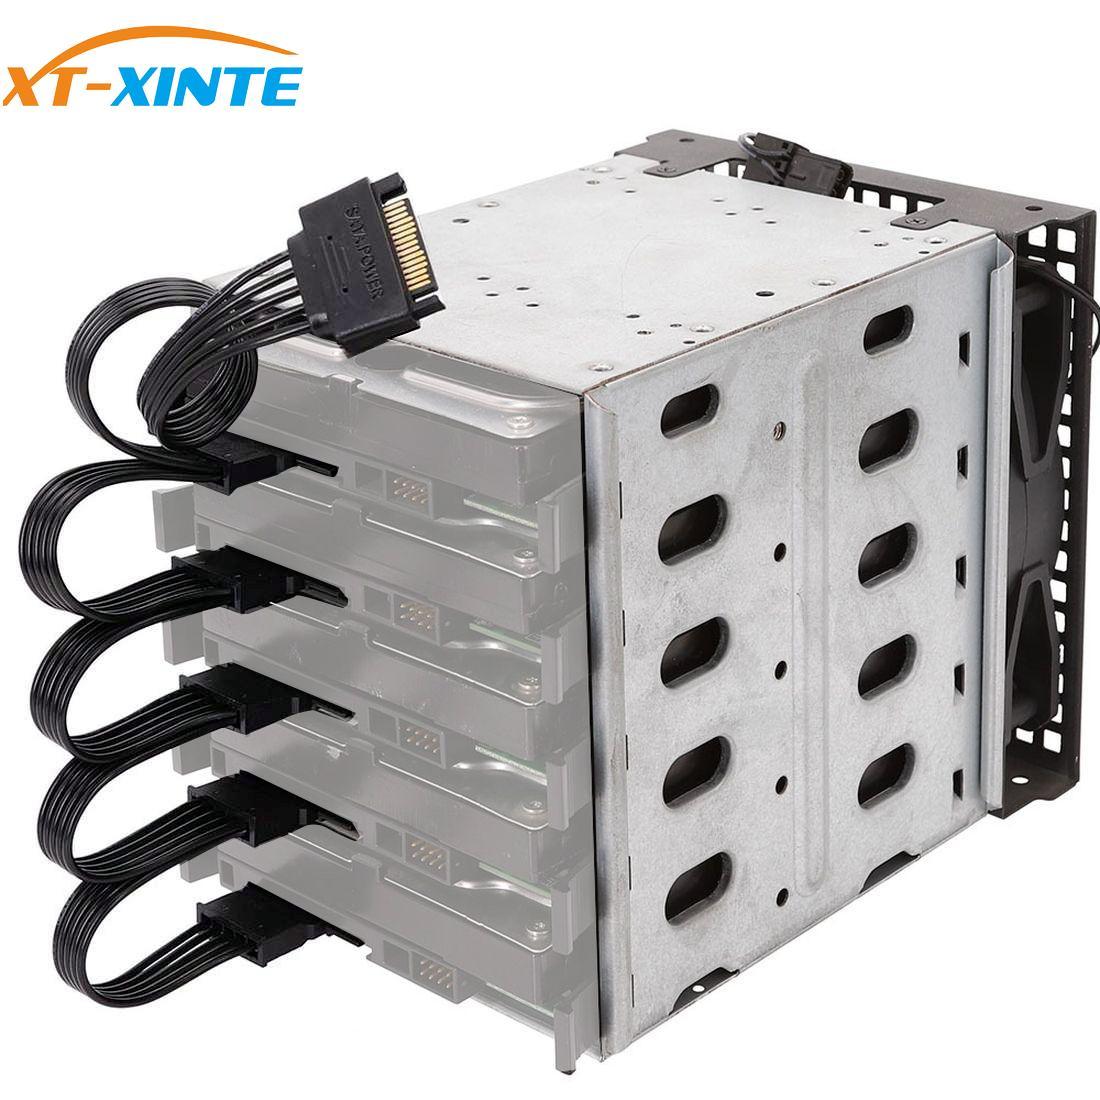 XT-XINTE 5x3,5